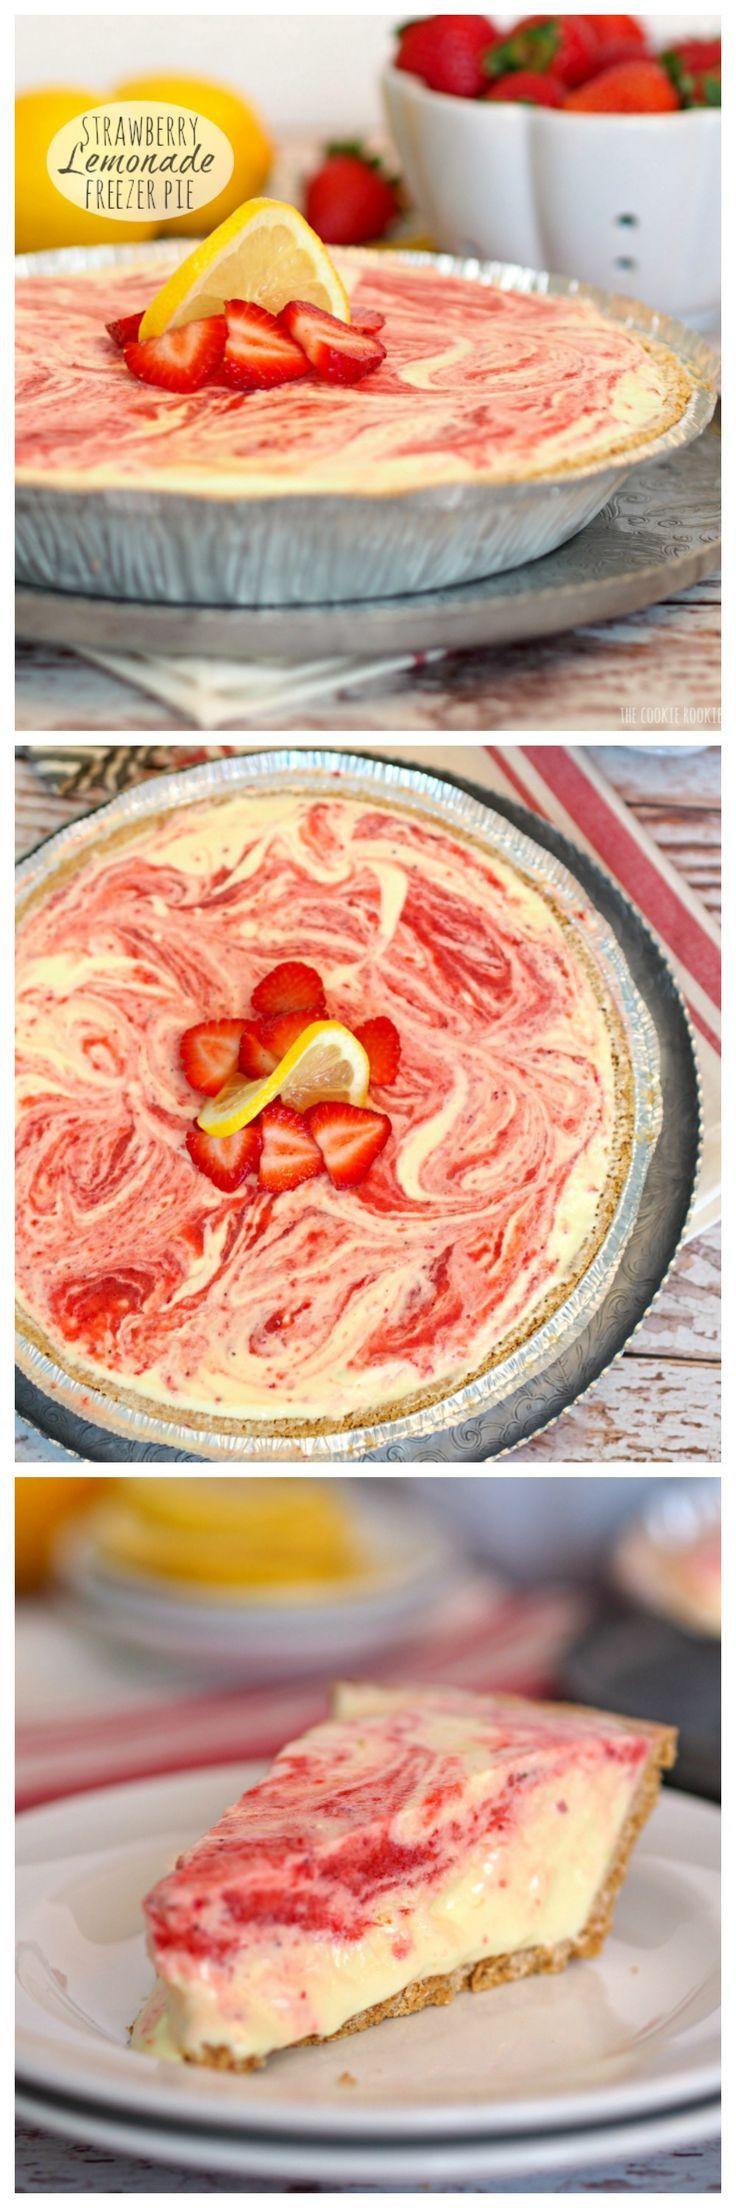 NO BAKE Strawberry Lemonade Freezer Pie! Easiest dessert you'll ever make.  My favorite! - The Cookie Rookie